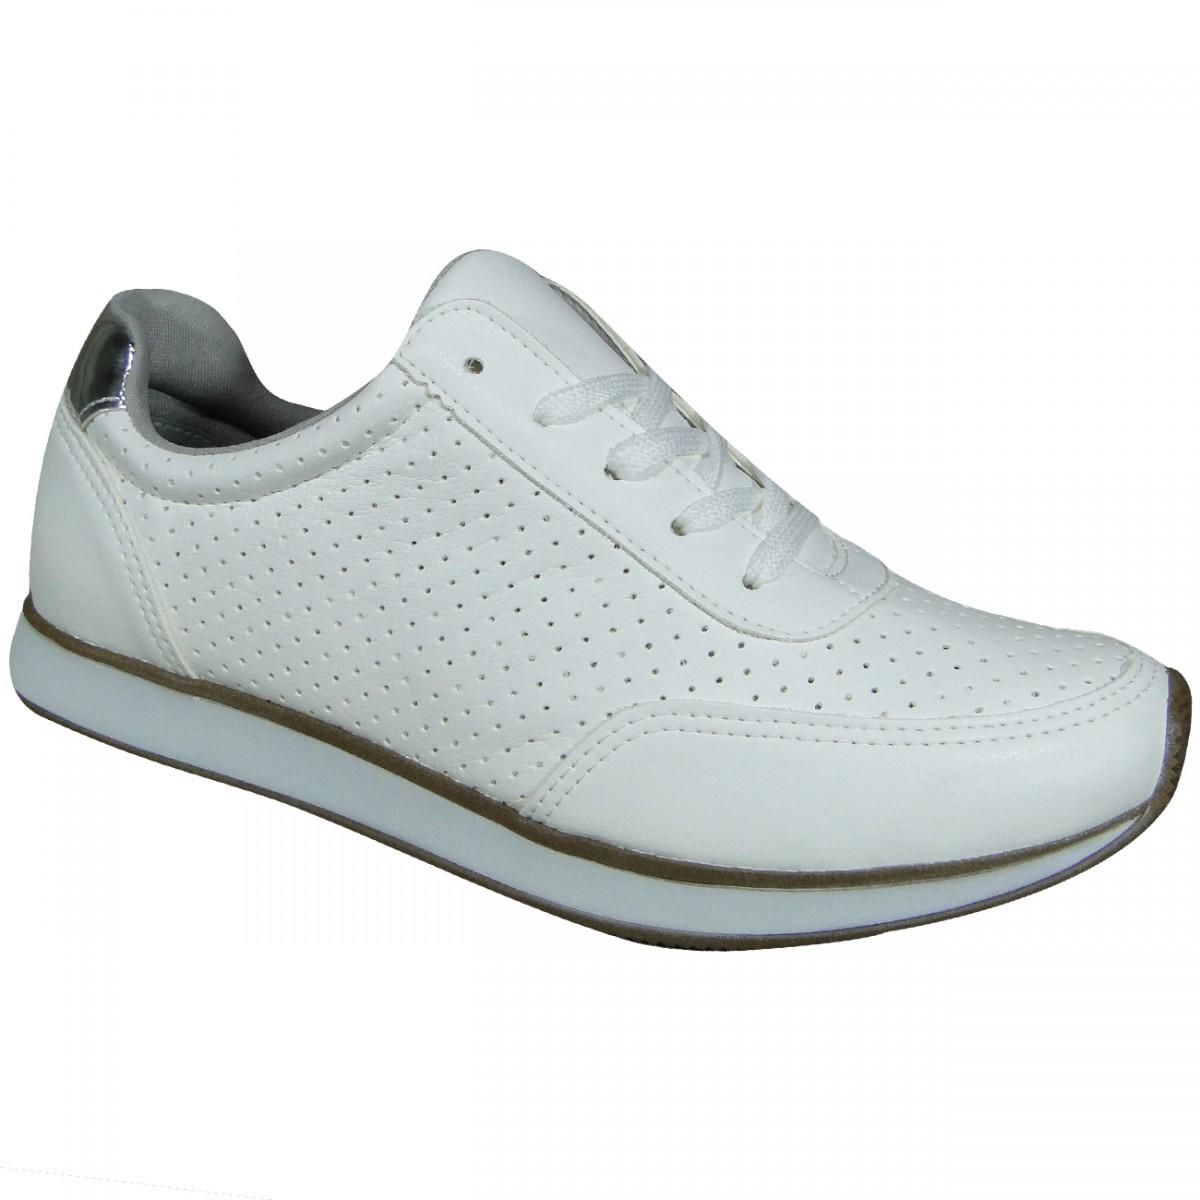 8502b18cfe Tenis Via Marte 16-12501 16-12501 - Branco Prata - Chuteira Nike ...